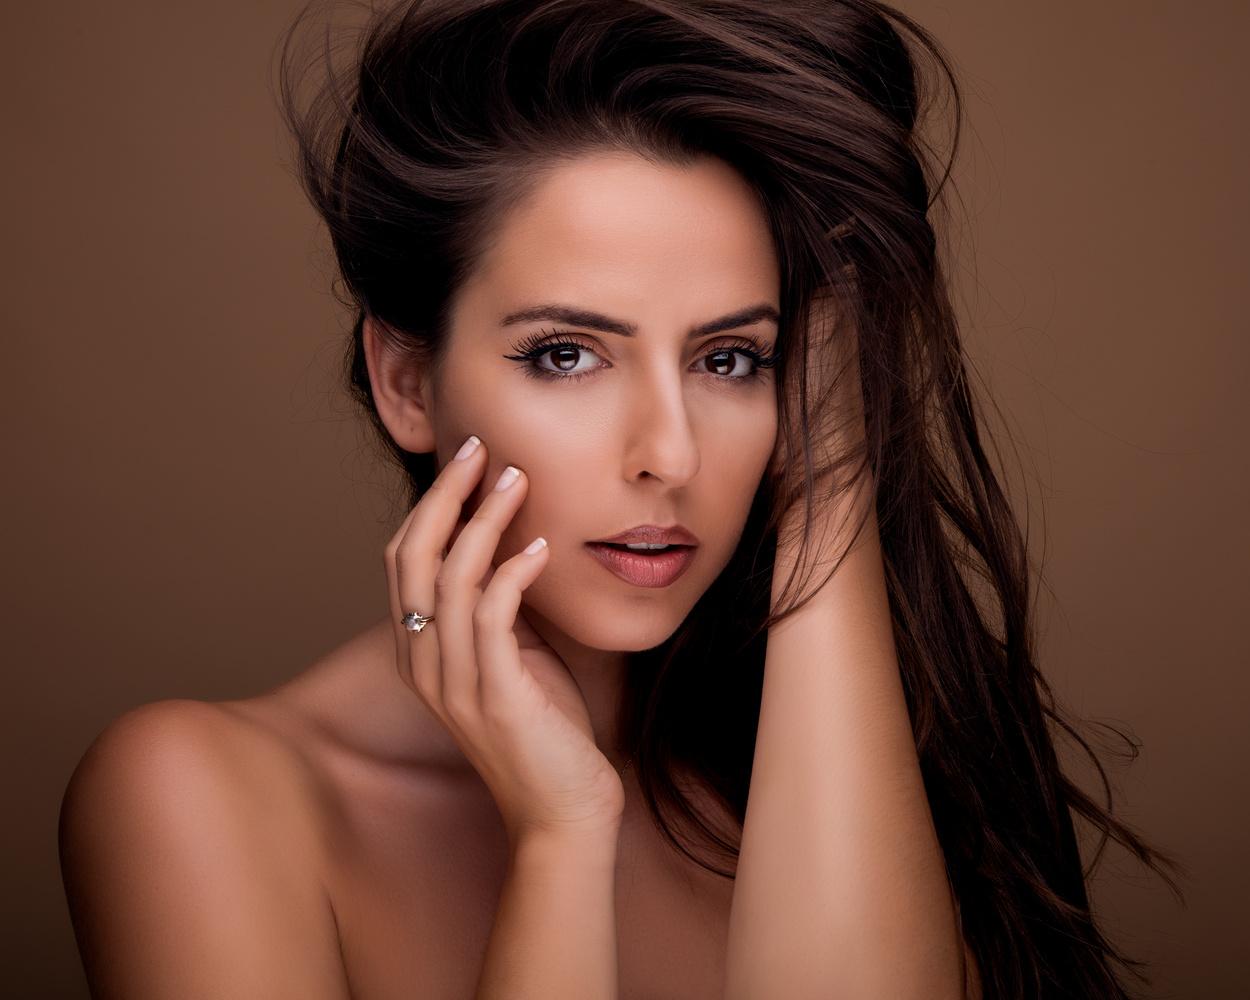 Beauty Portrait by Eddie Merino